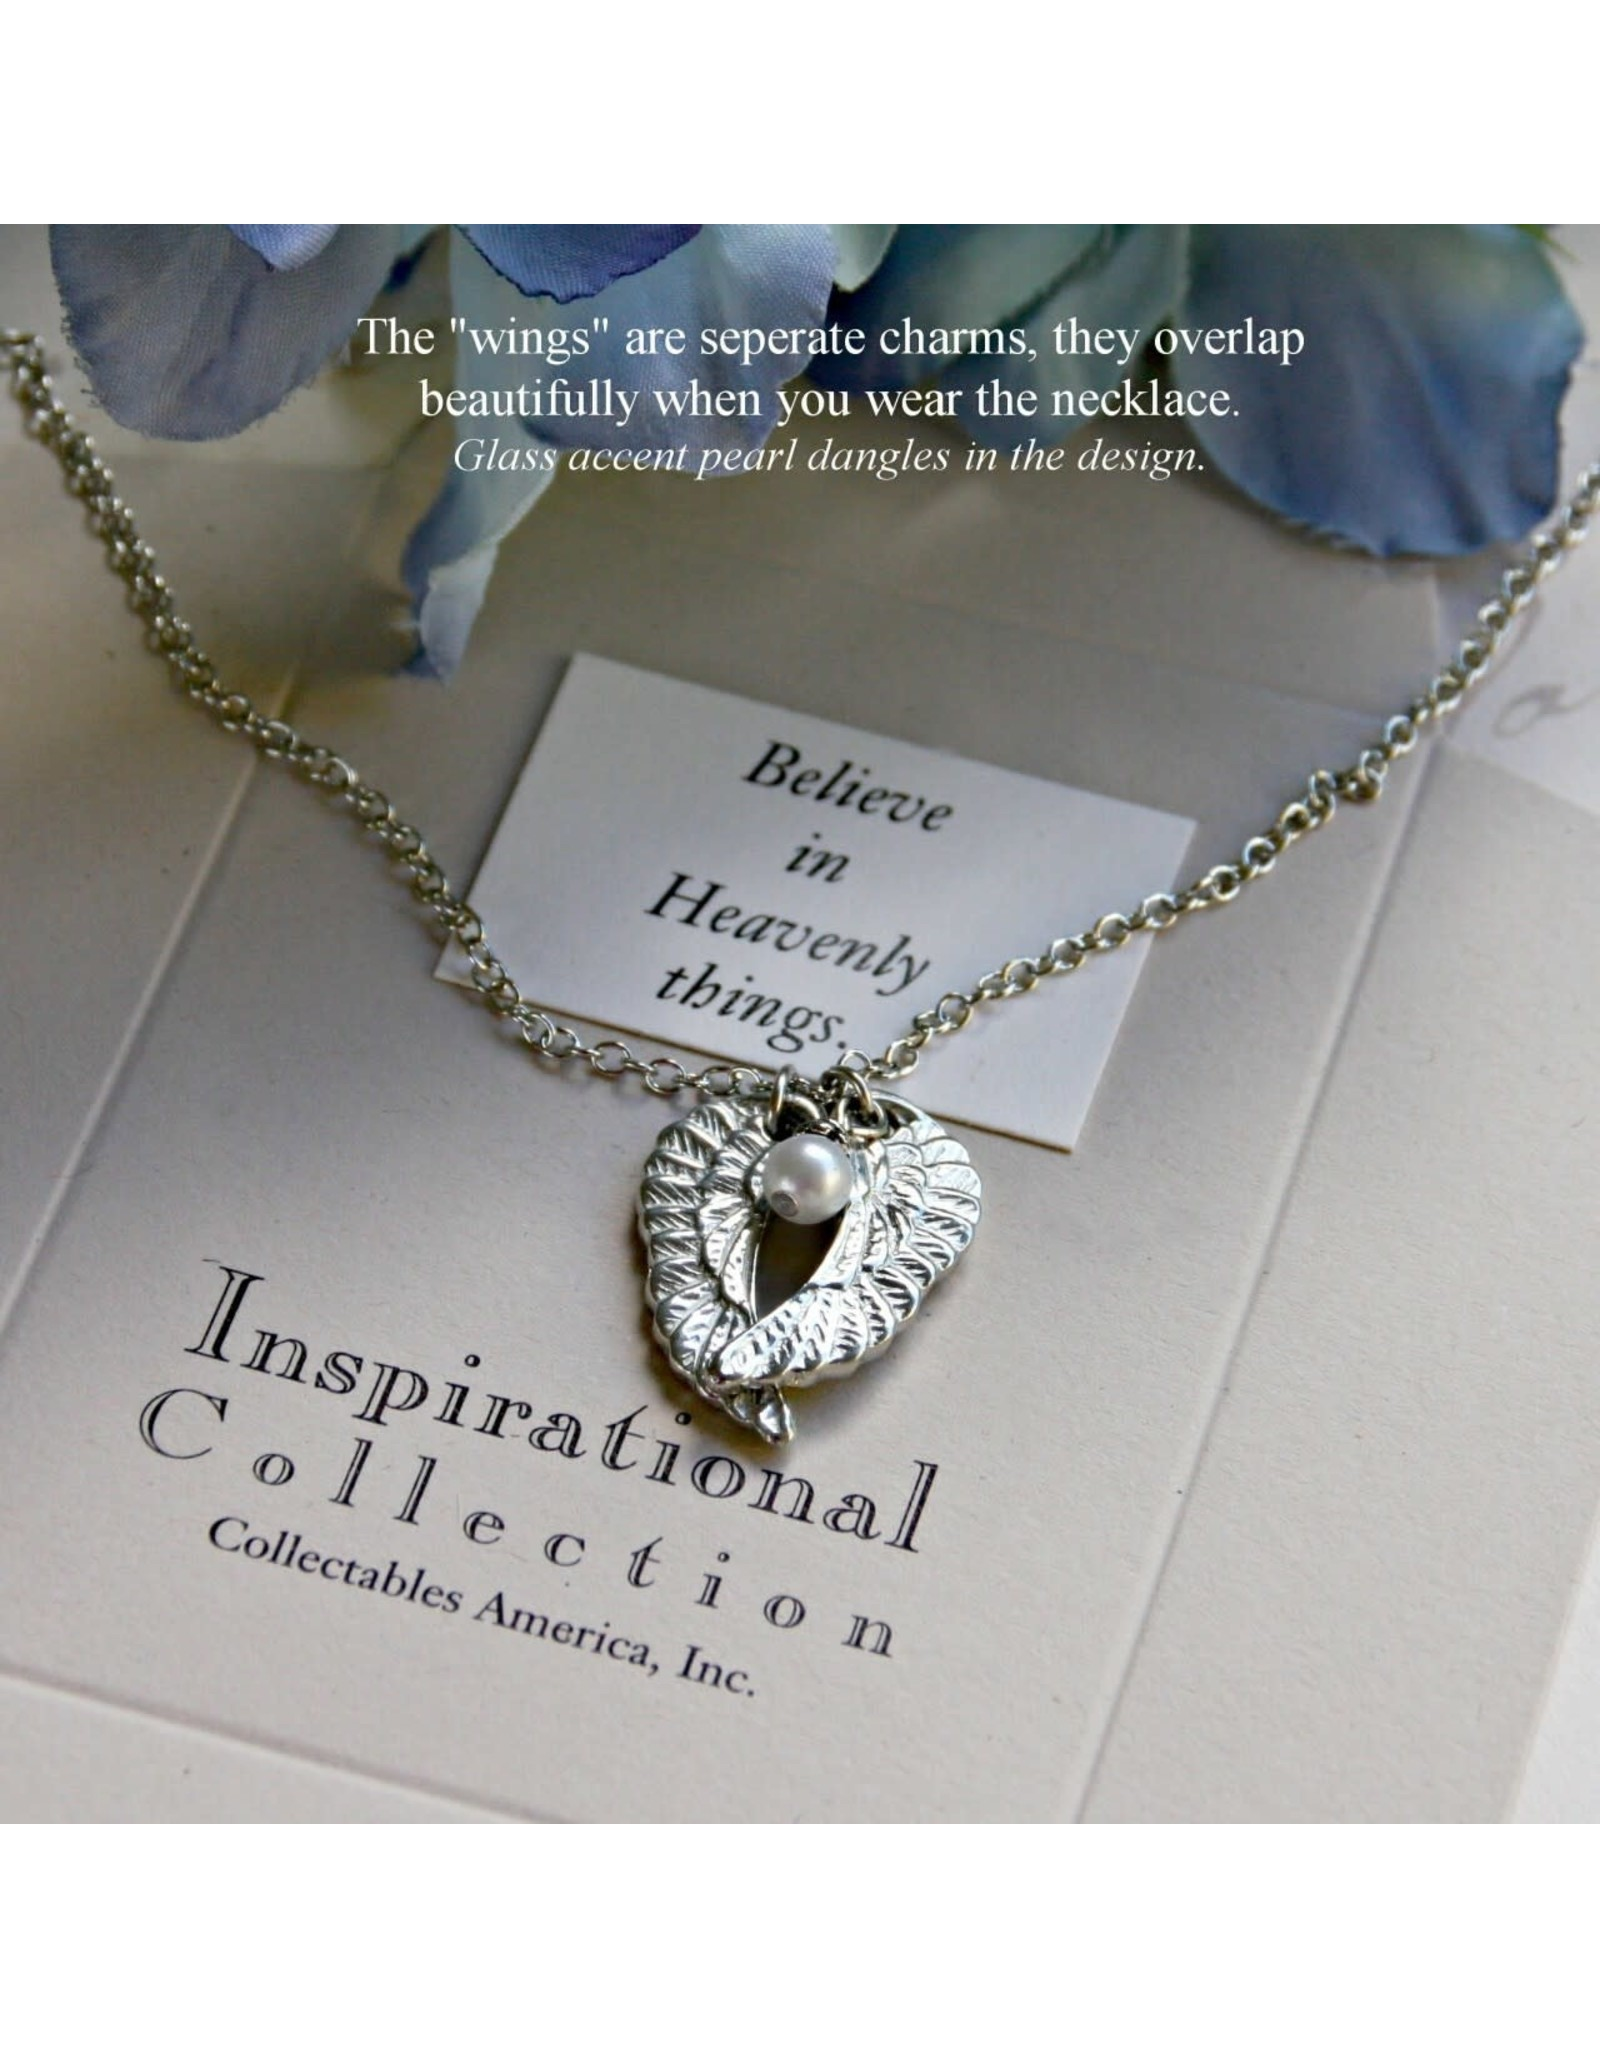 Angel Wings Necklace, Believe in Heavenly Things